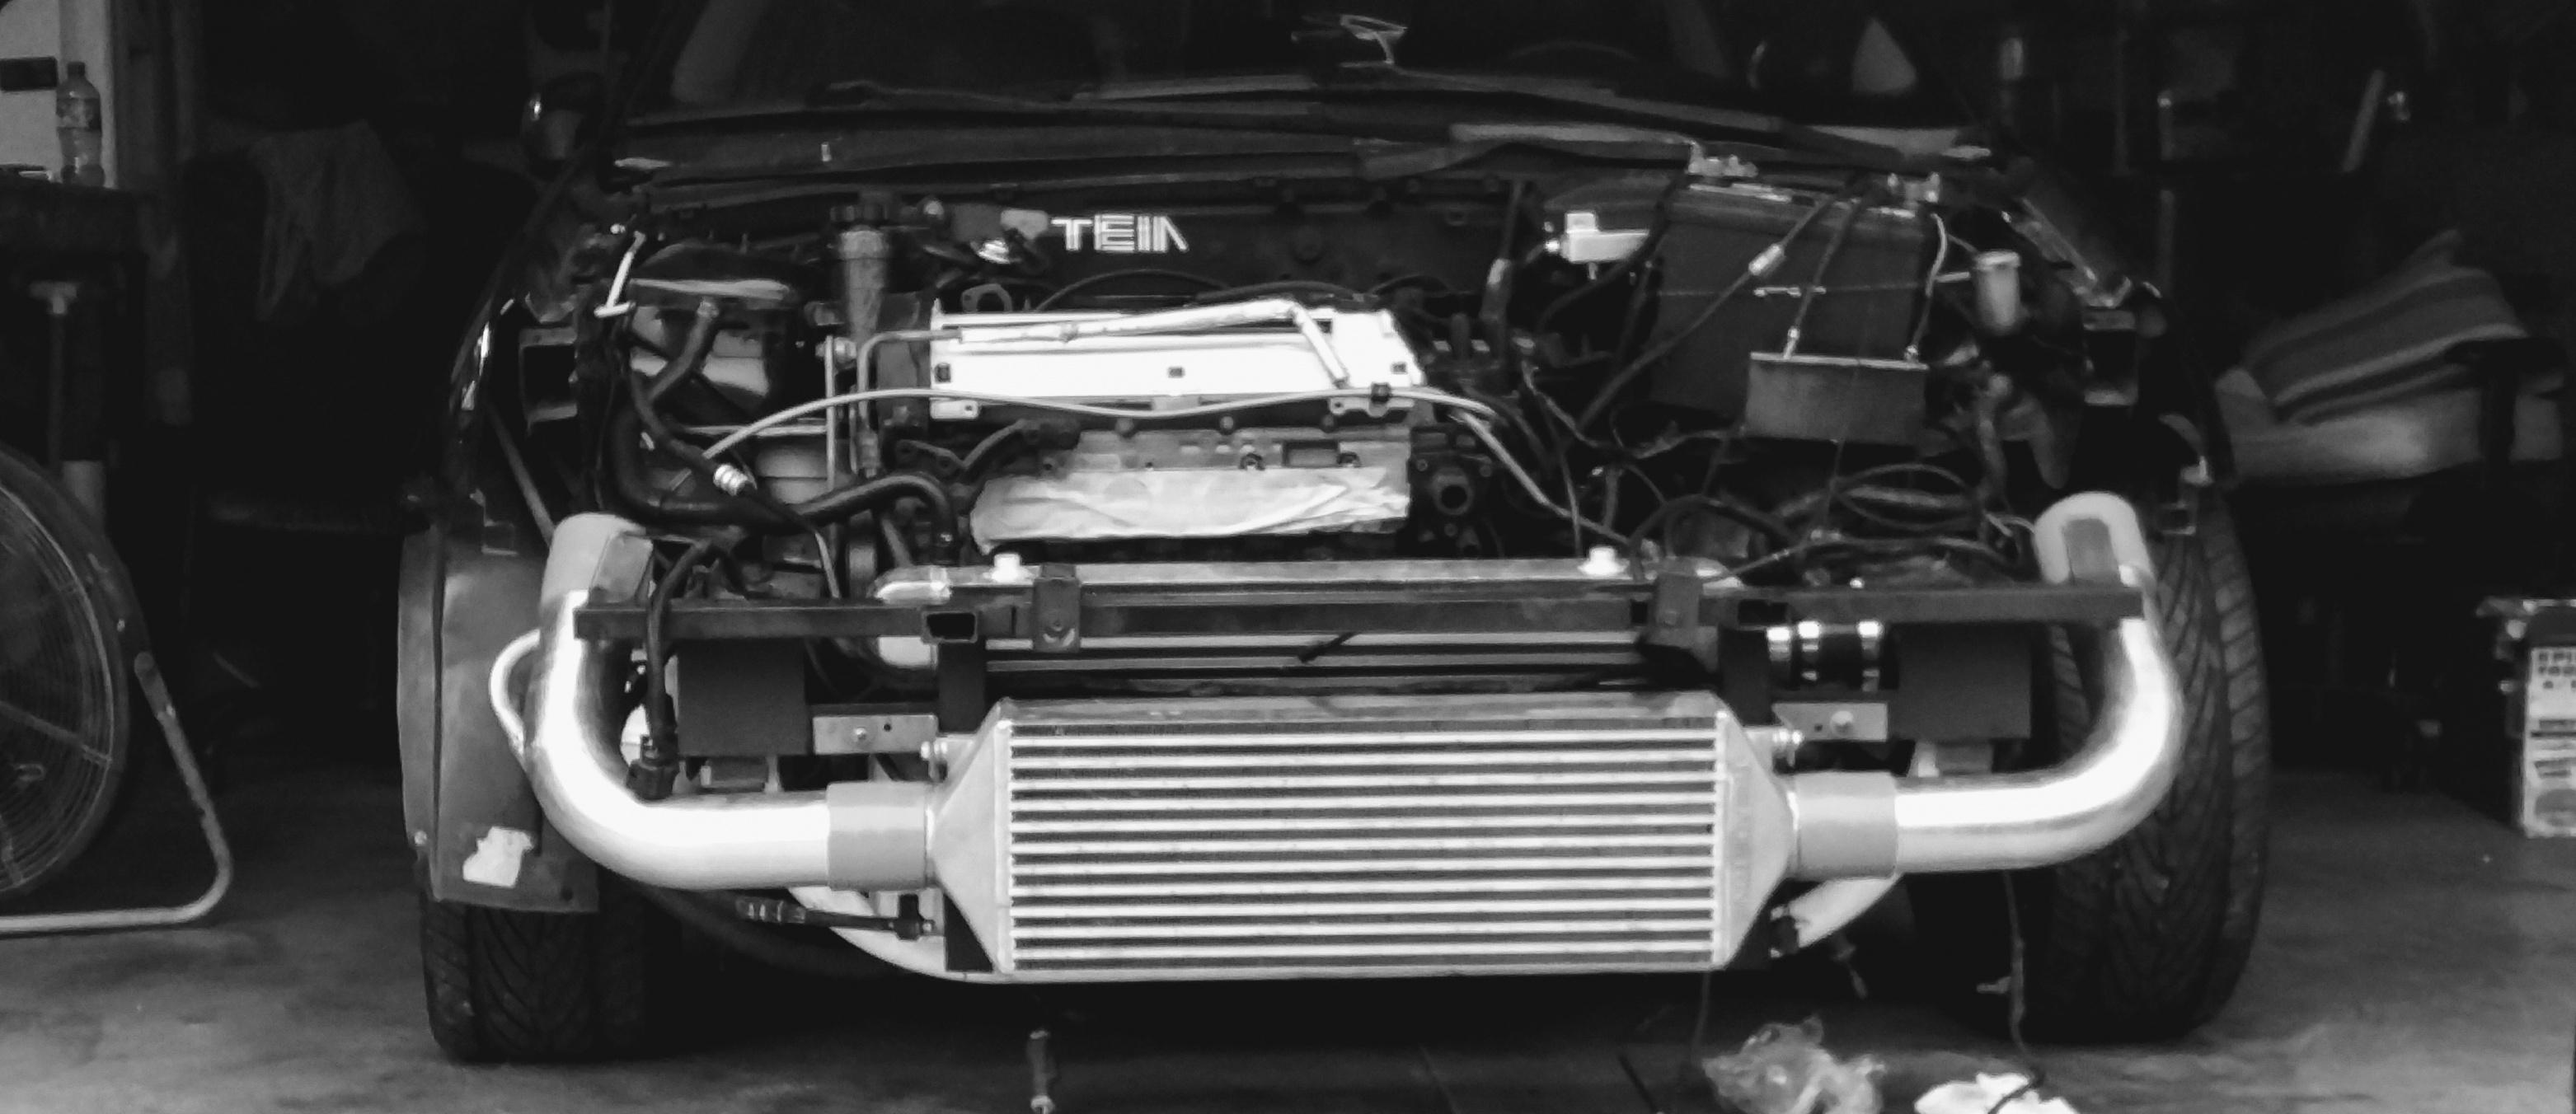 SWFL Fanatics?-front-turbo.jpg